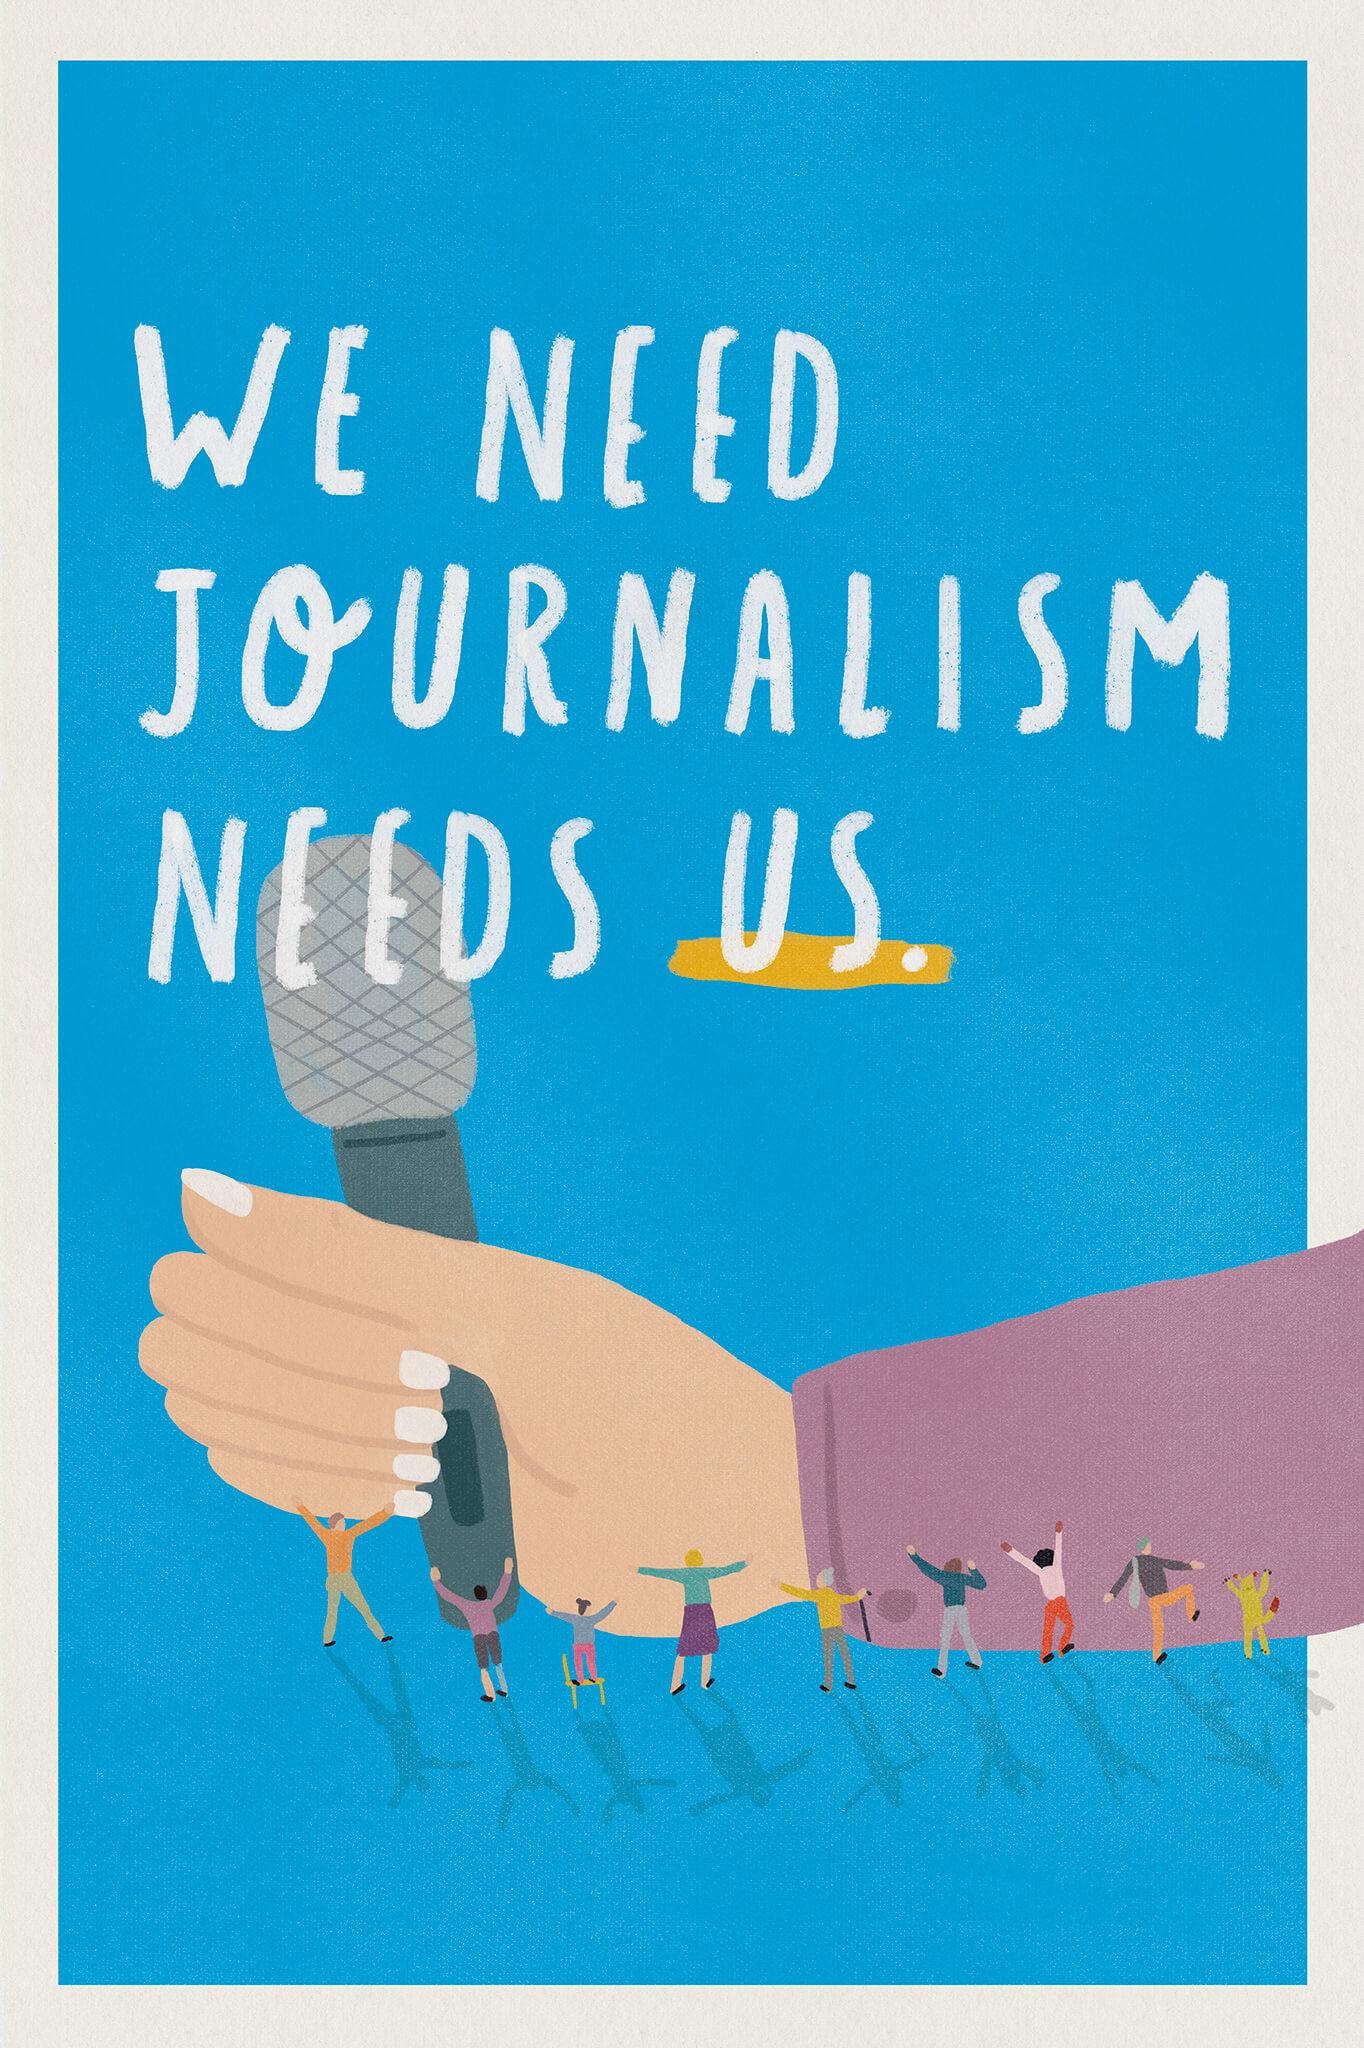 We Need Journalism (series, 2/3) main image